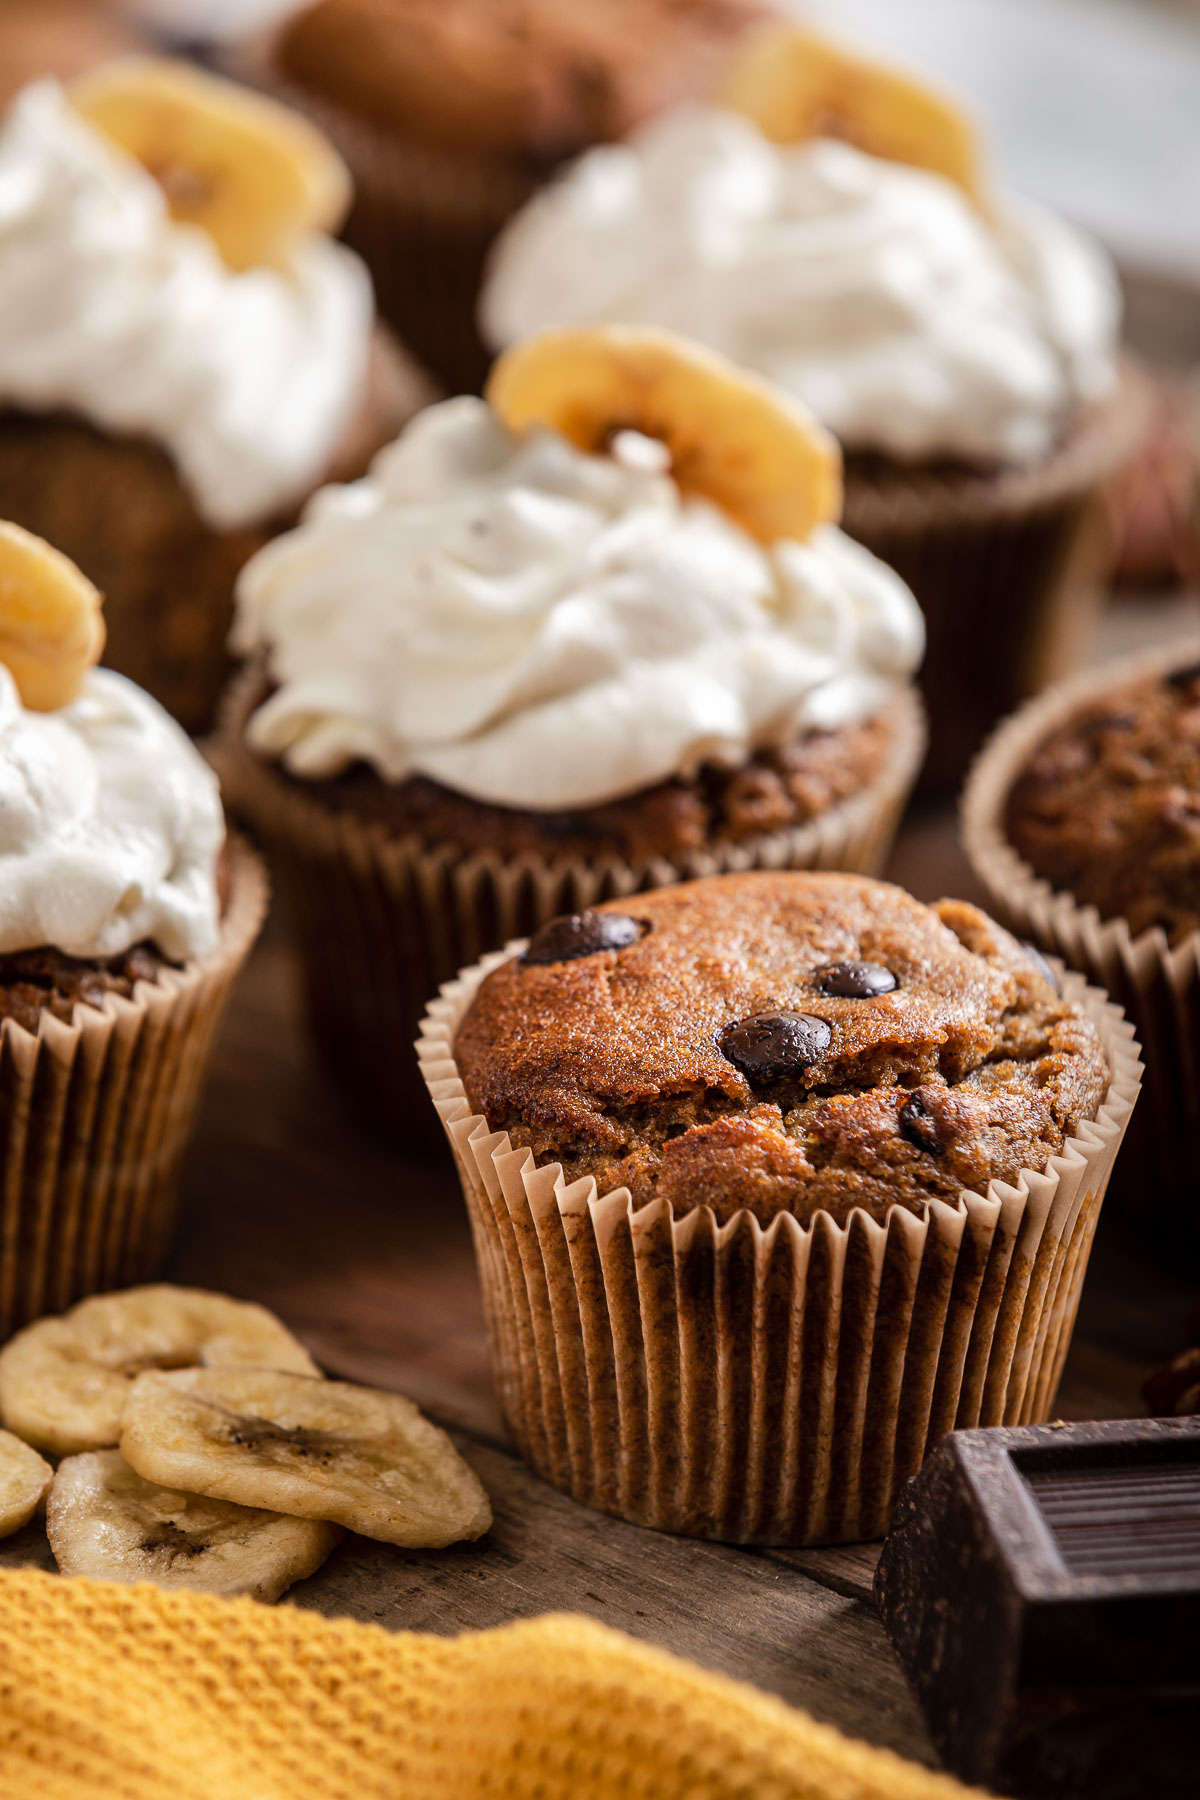 ricetta CUPCAKES VEGAN alla BANANA senza glutine con cioccolato chocolate chip gluten-free VEGAN BANANA CUPCAKES recipe